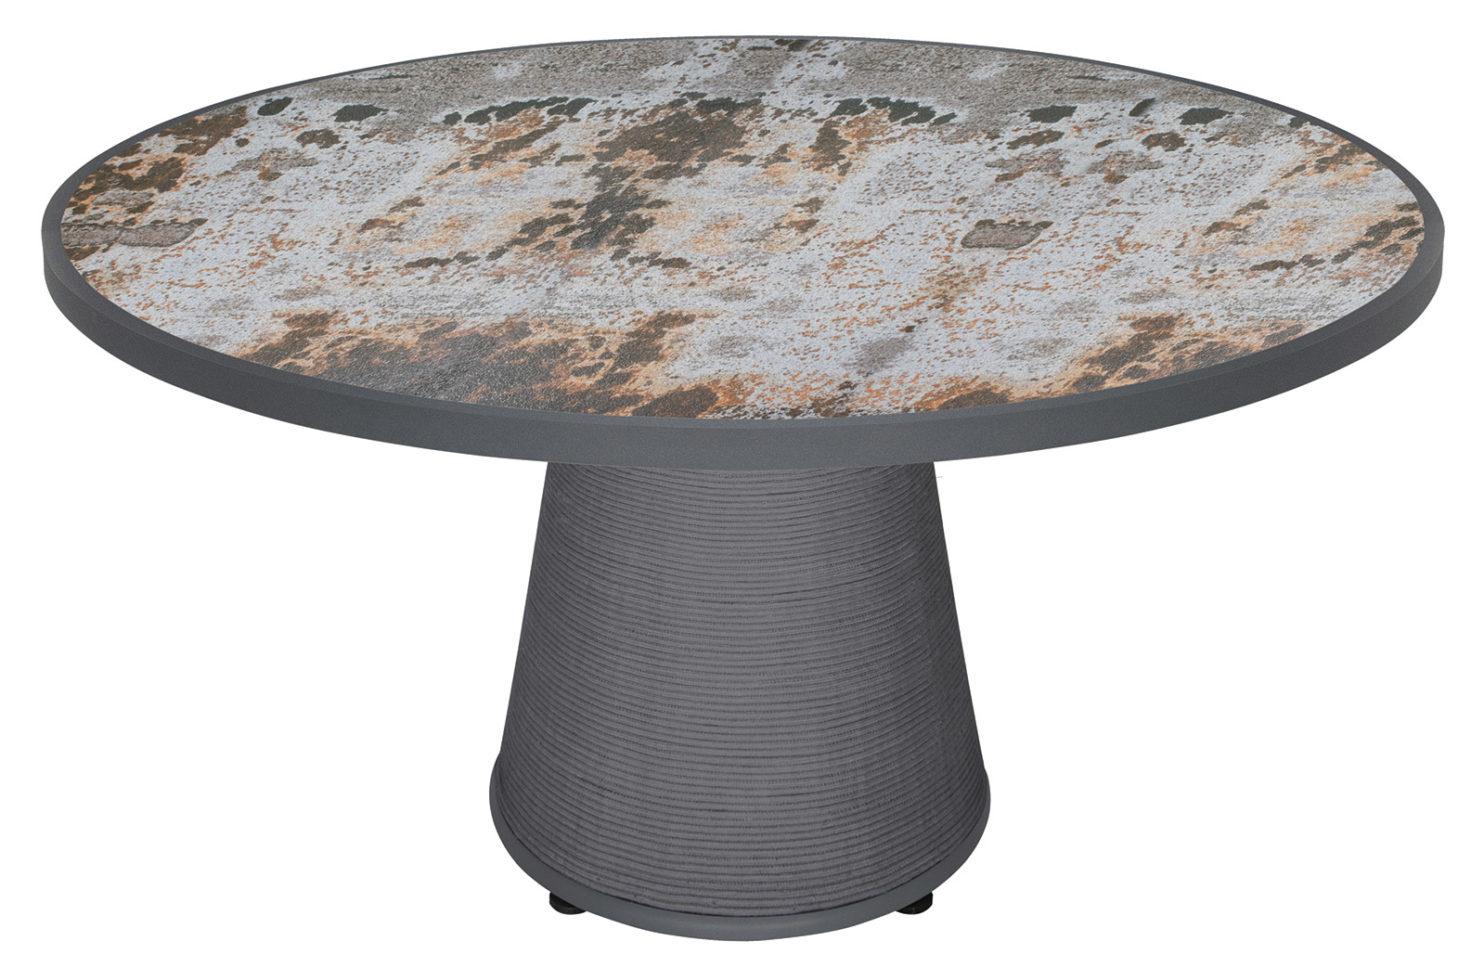 Archipelago alexander table 620FT100P2BBT DWT 1 3Q